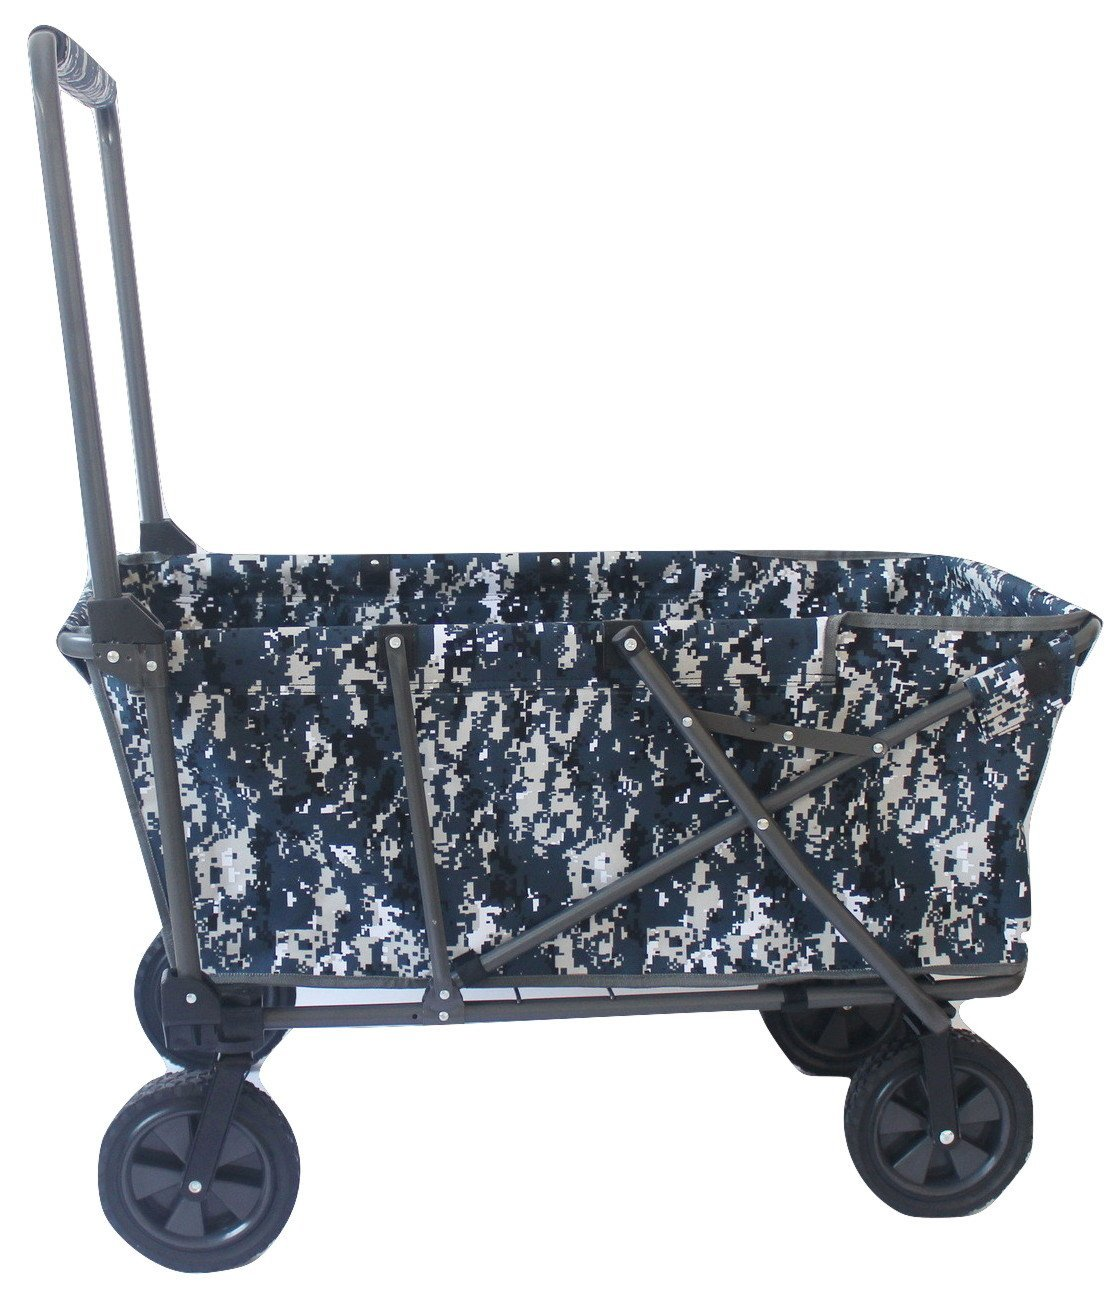 Pearington Sports Collapsible Folding Outdoor Utility Wagon Camo